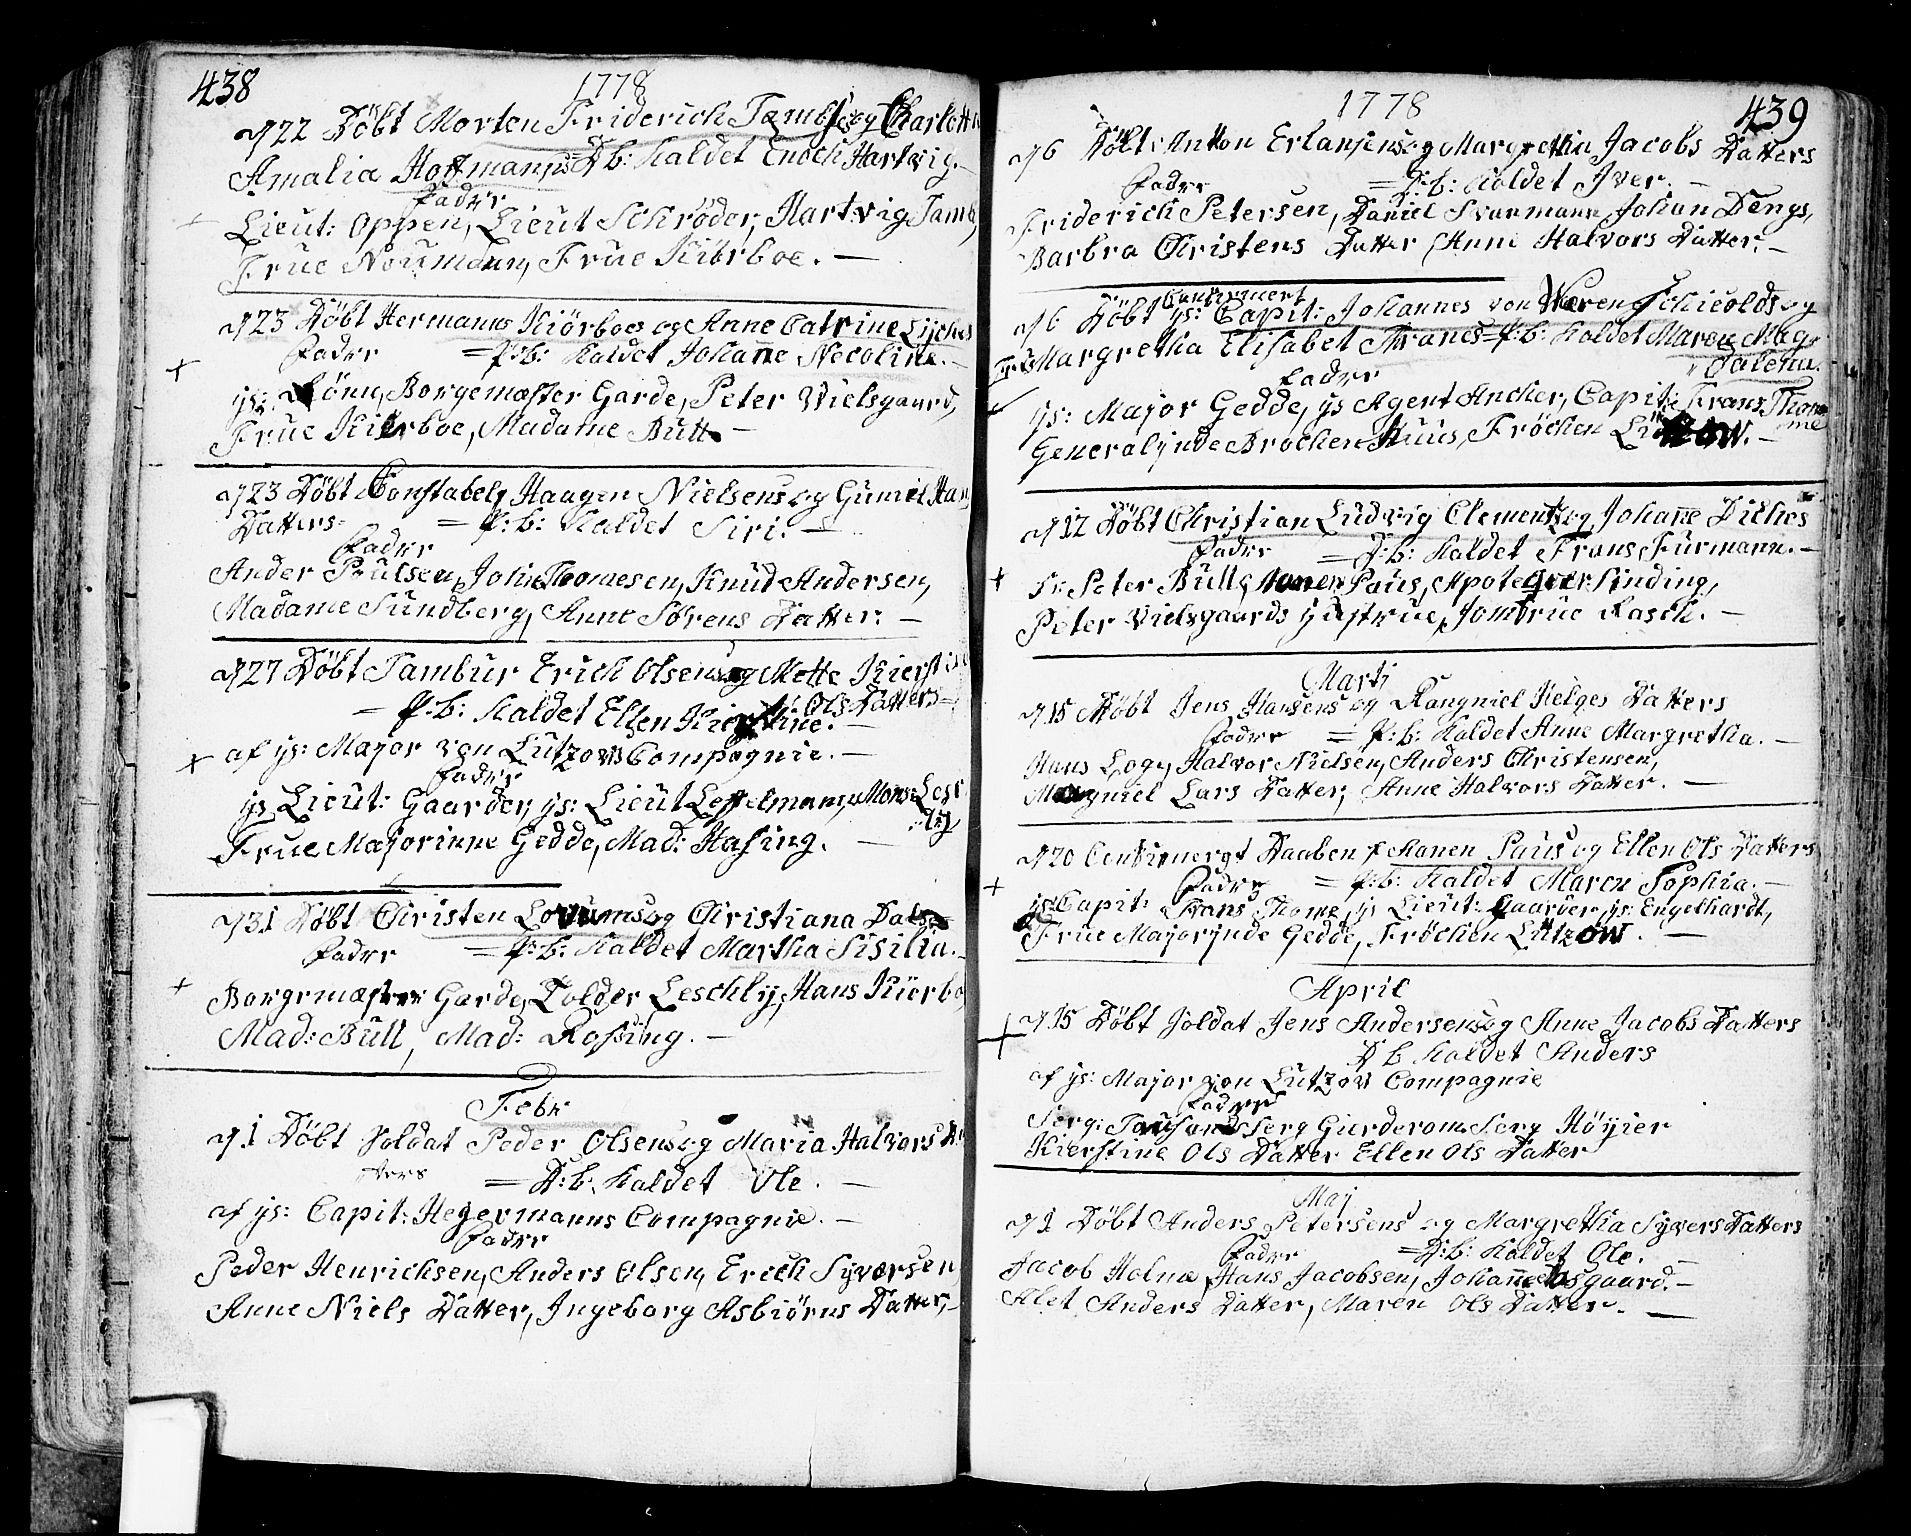 SAO, Fredrikstad prestekontor Kirkebøker, F/Fa/L0002: Ministerialbok nr. 2, 1750-1804, s. 438-439